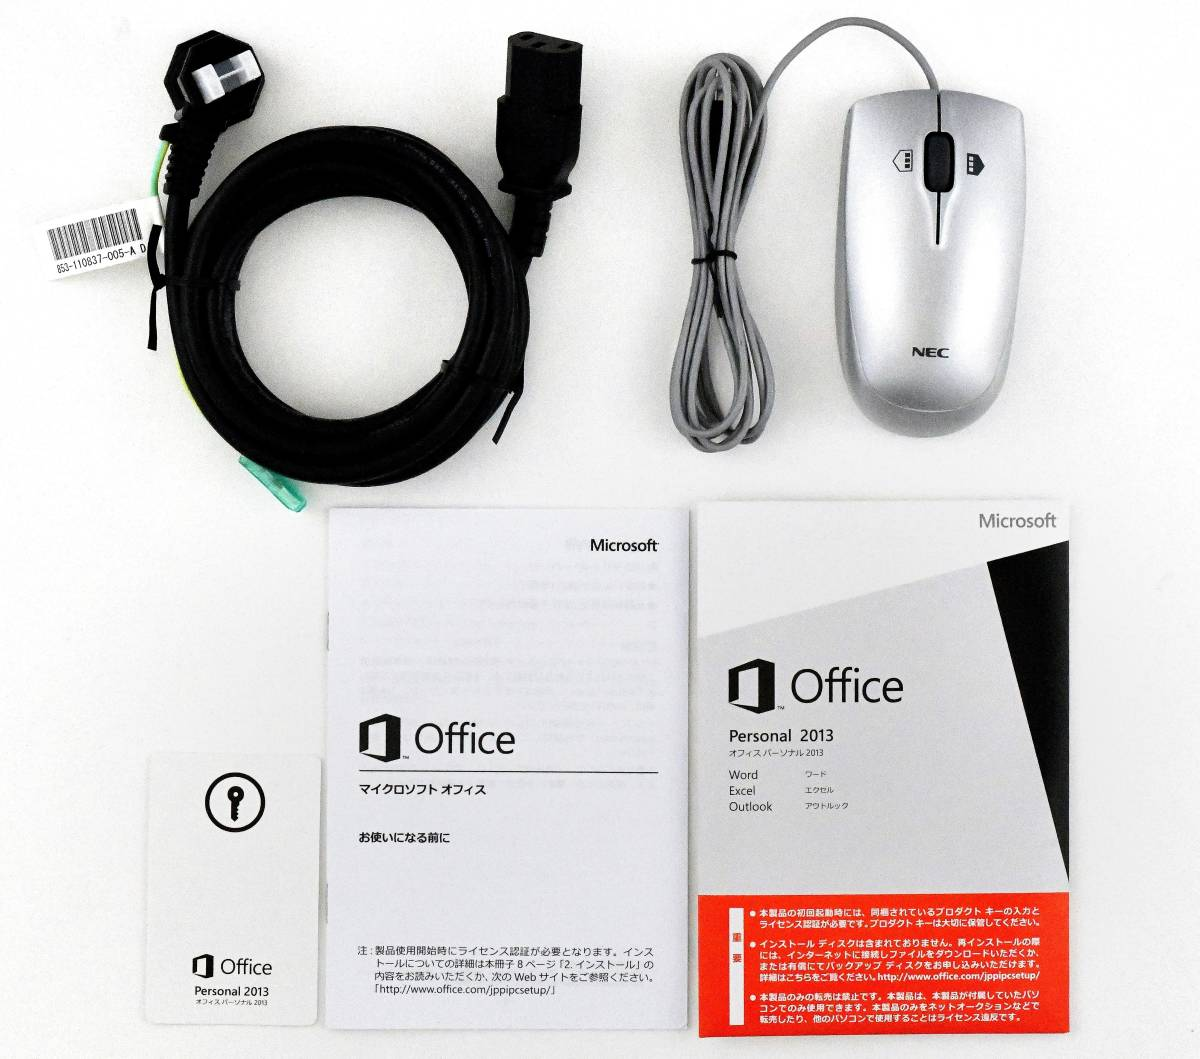 ★NEC デスクトップパソコン Mate MK33ML-K Windows10 Pro 32bit Corei5 メモリ4GB HDD500GB Office Personal 2013★ _画像8